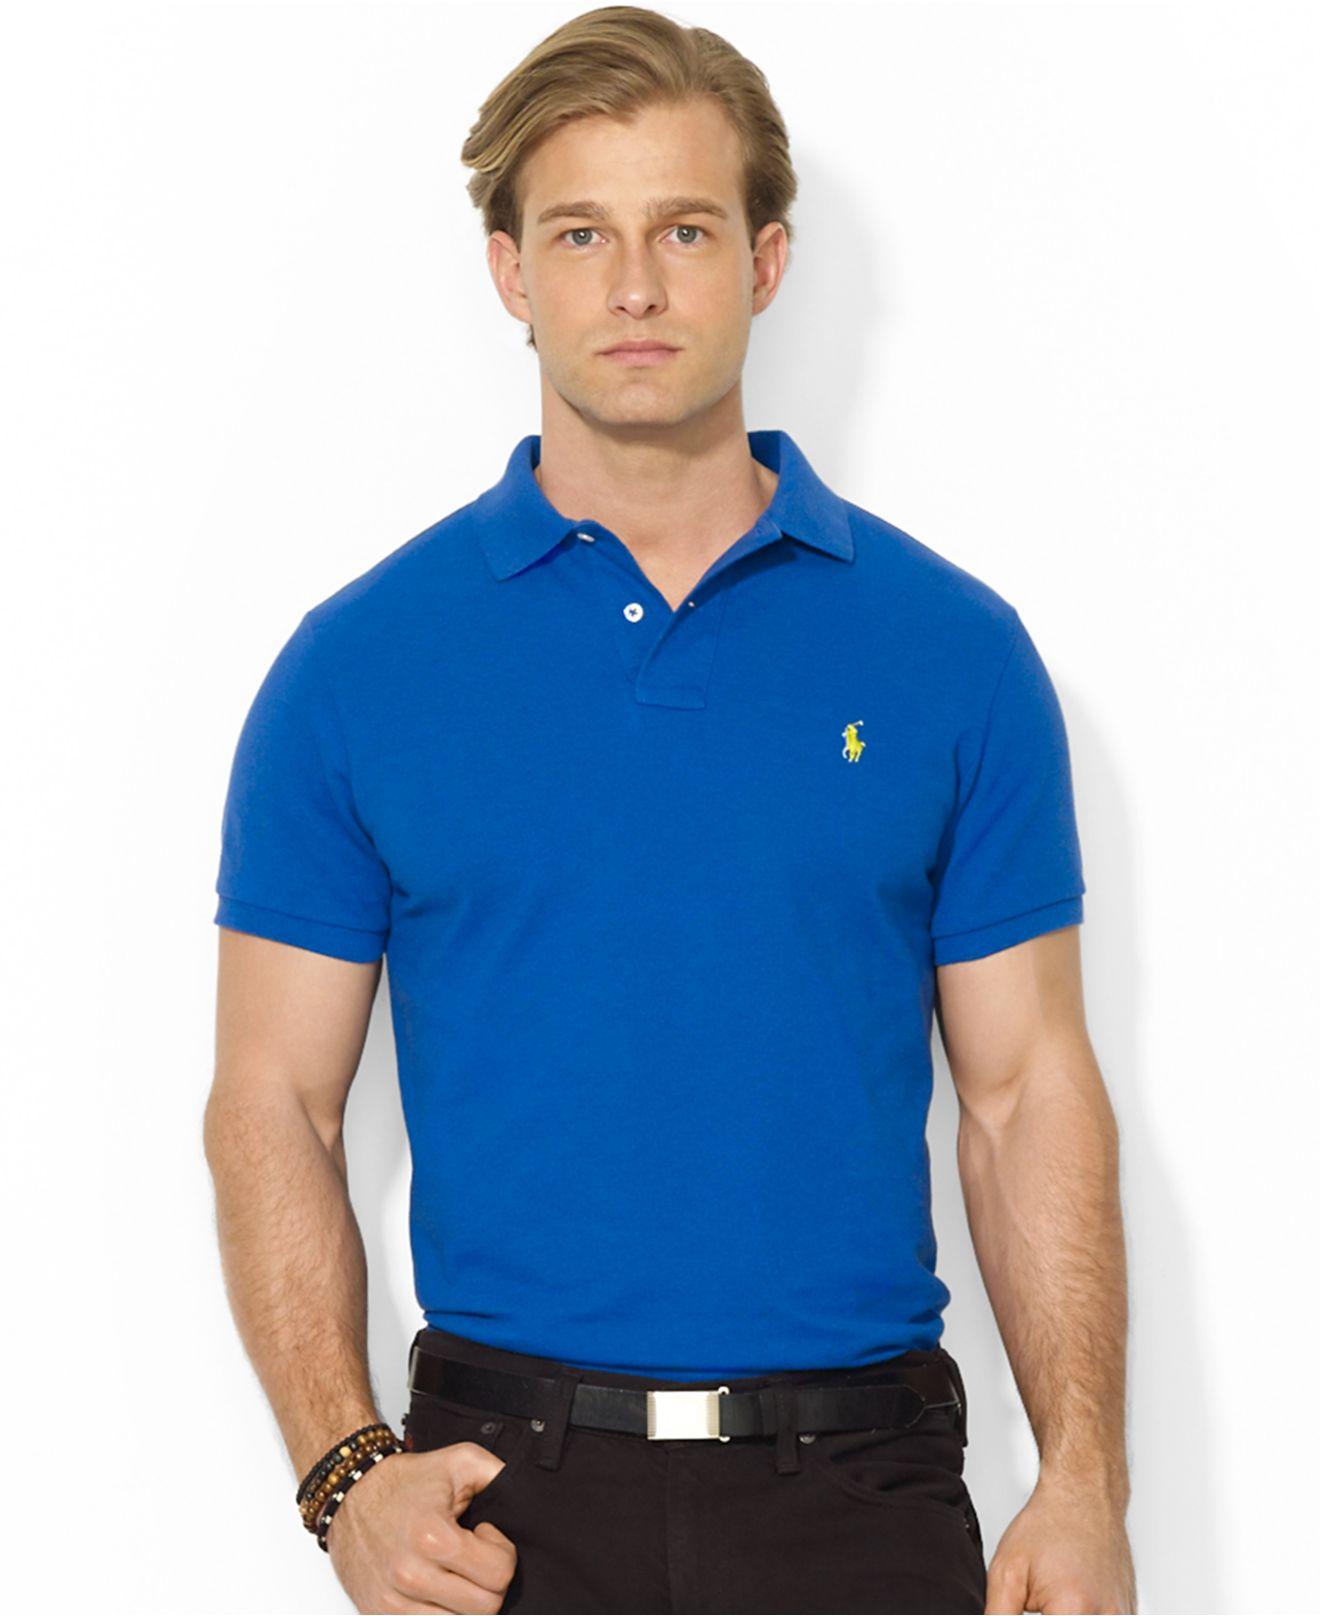 Lyst polo ralph lauren custom fit mesh polo shirt in for Polo ralph lauren custom fit polo shirt